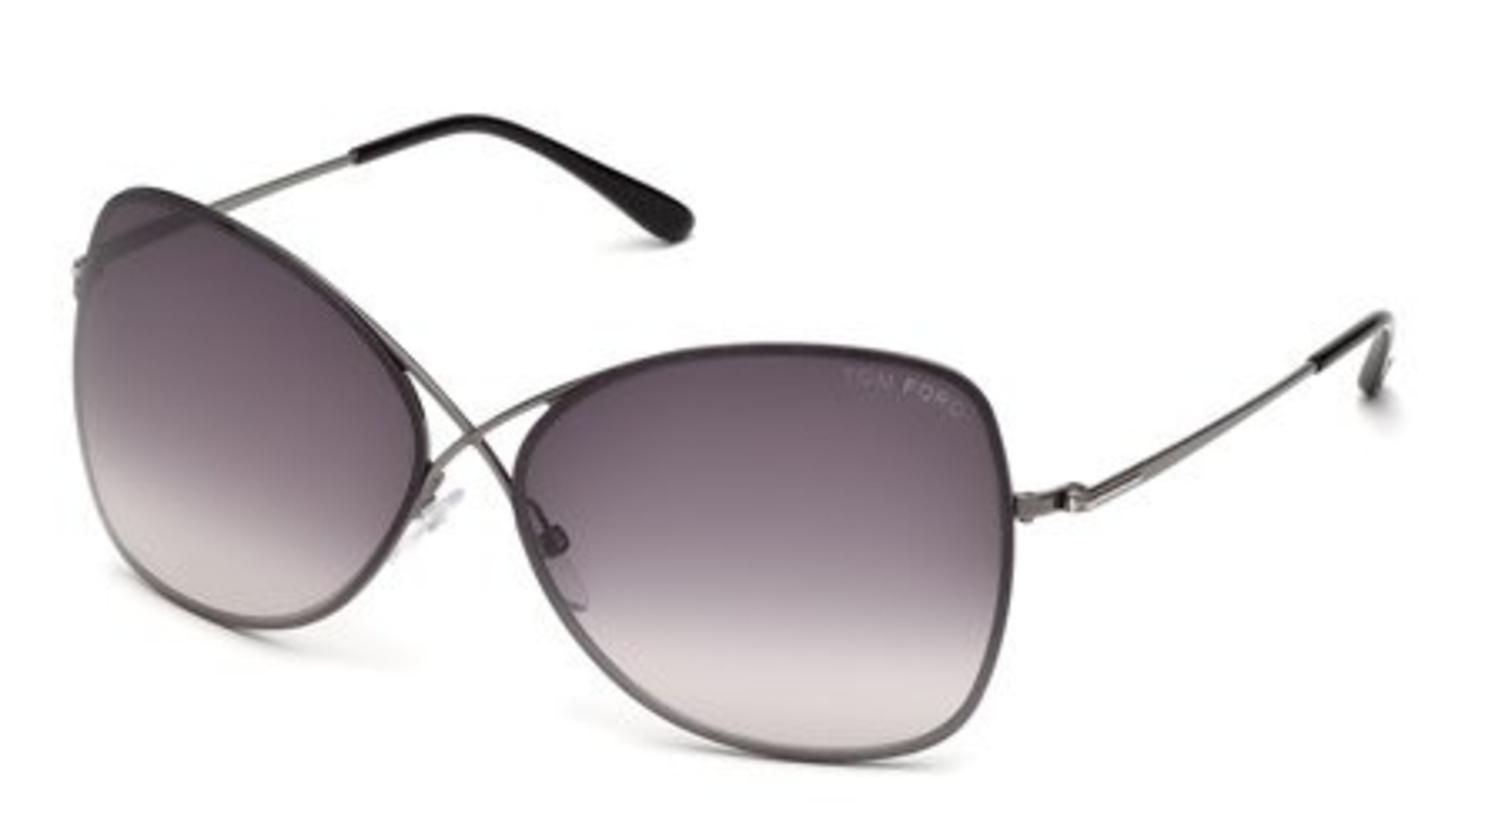 33b677529243 Tom Ford Colette FT2506308C Sunglasses